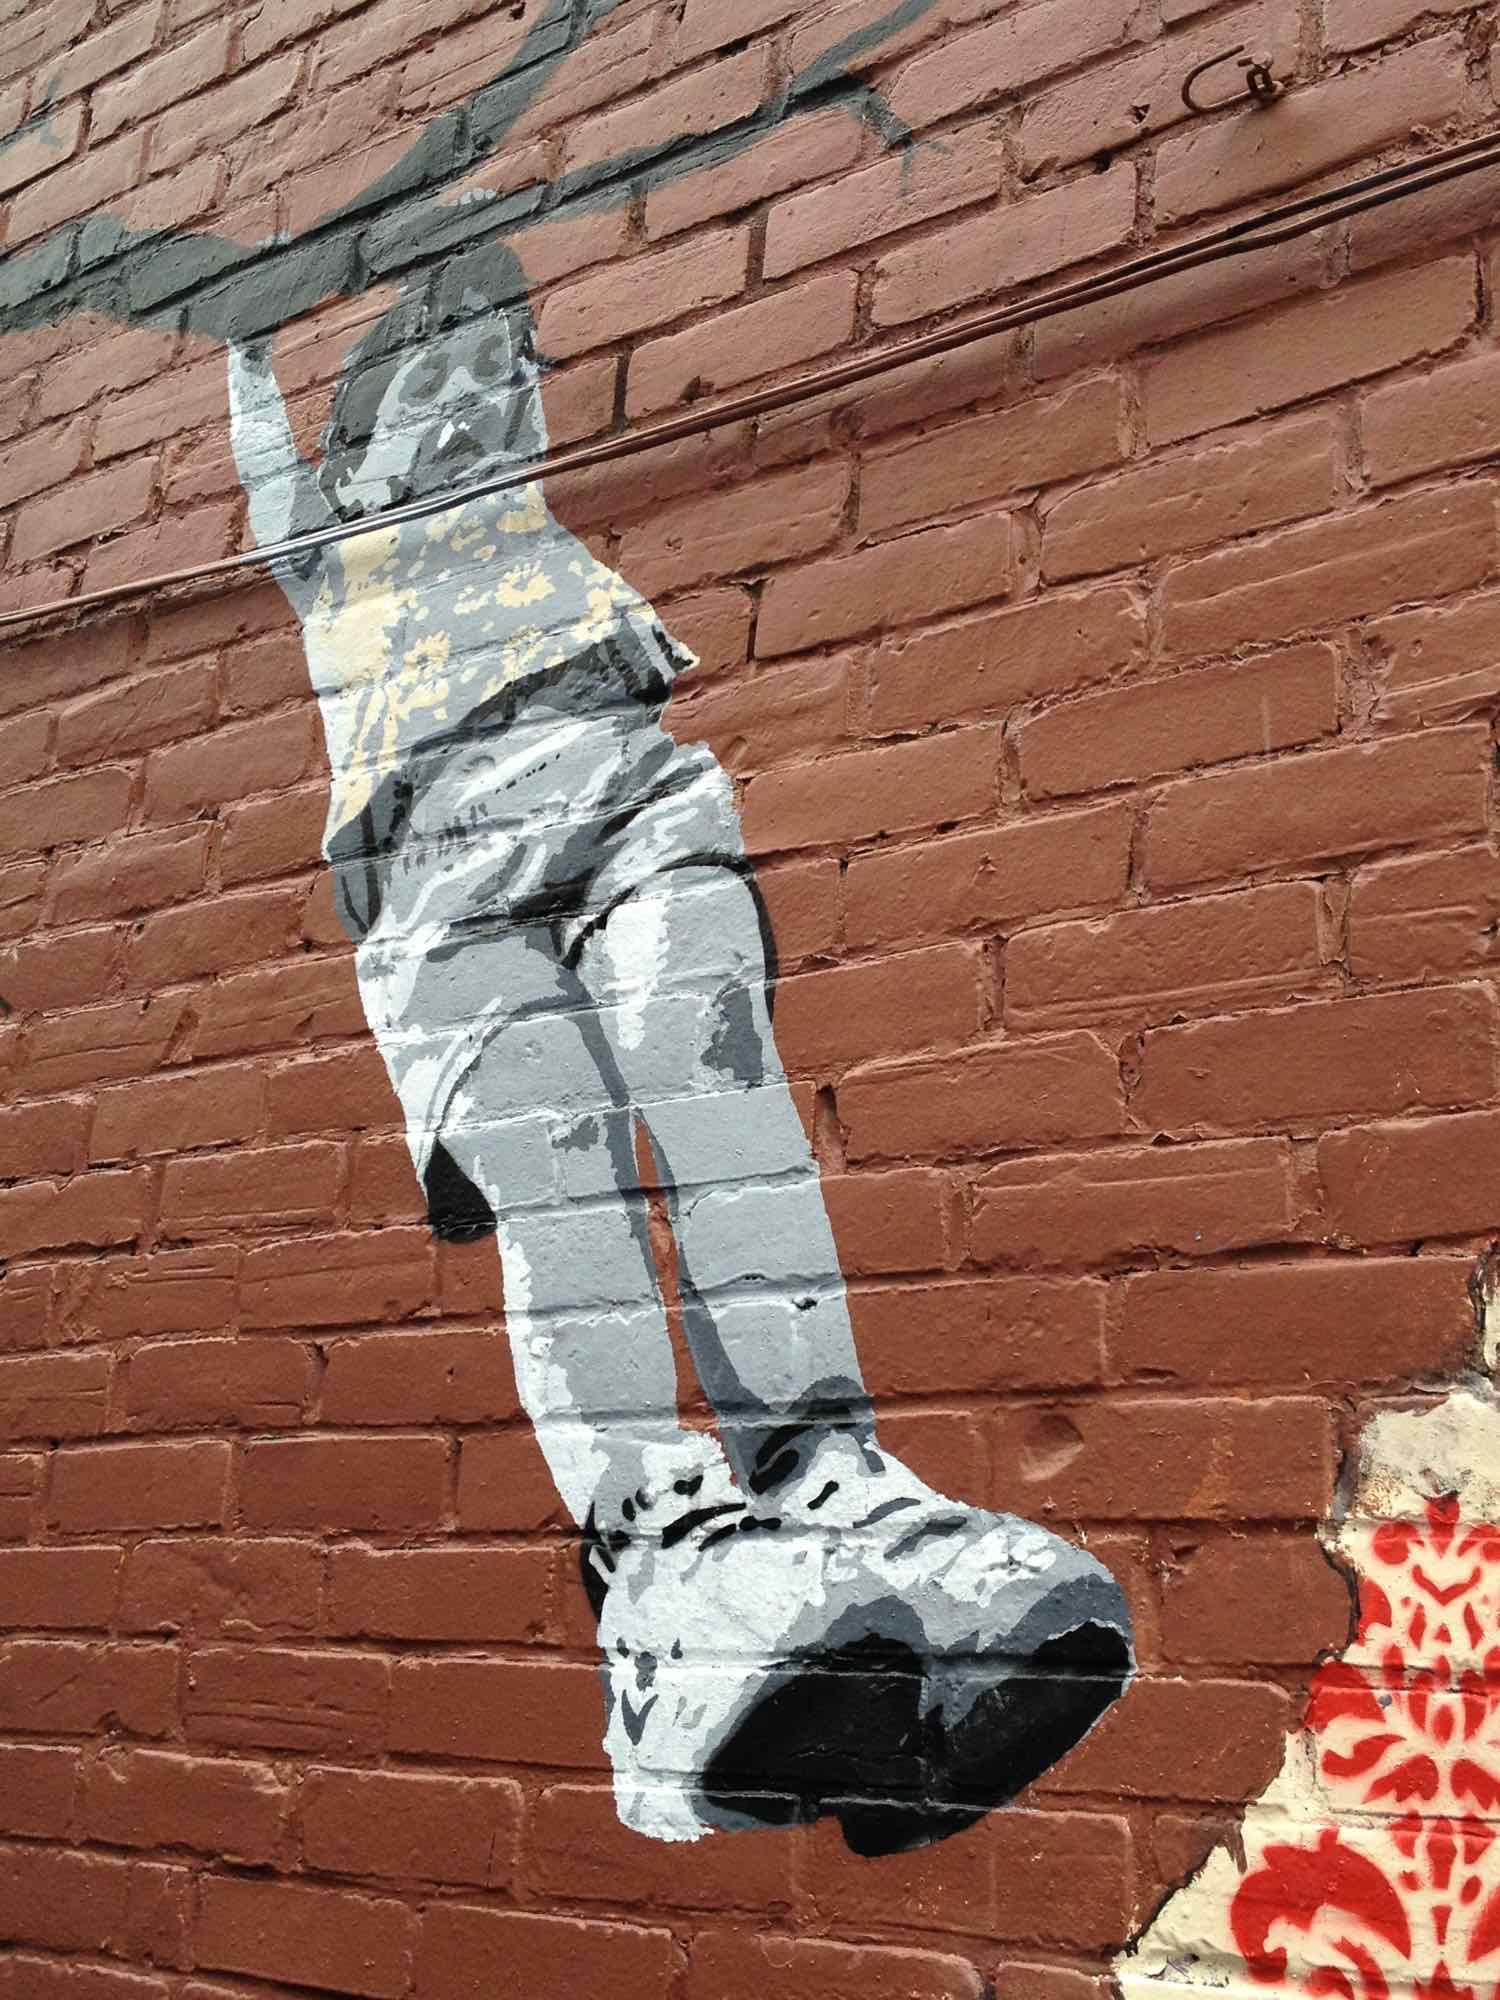 The_Walls_Of_Montreal-Ezra_Soiferman - 27.jpg